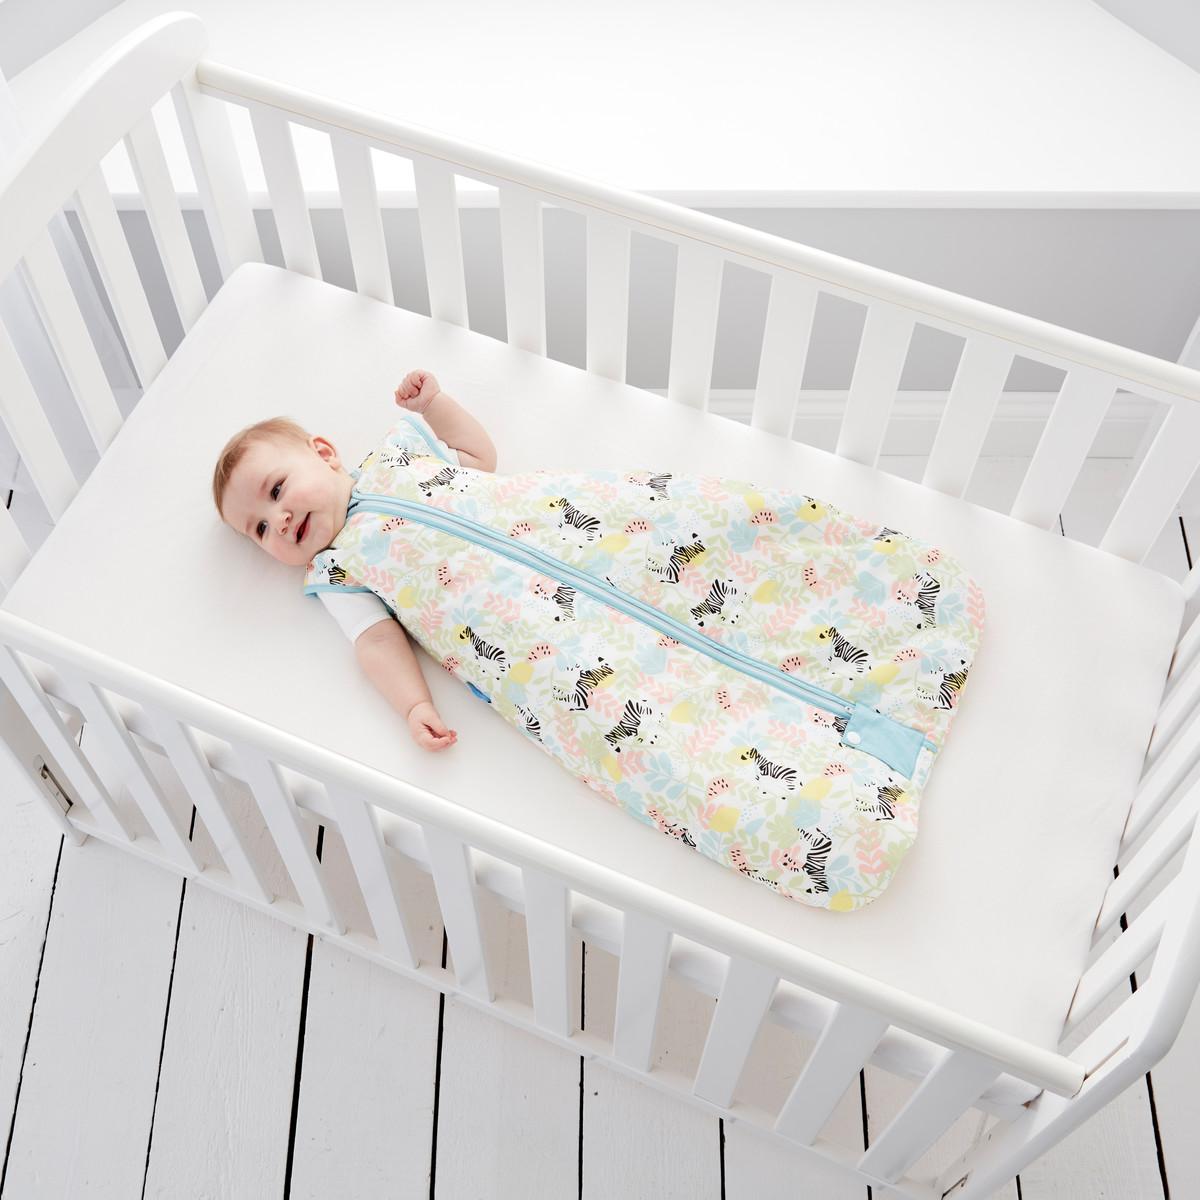 77f28149 Baby Products: Amazon.co.uk